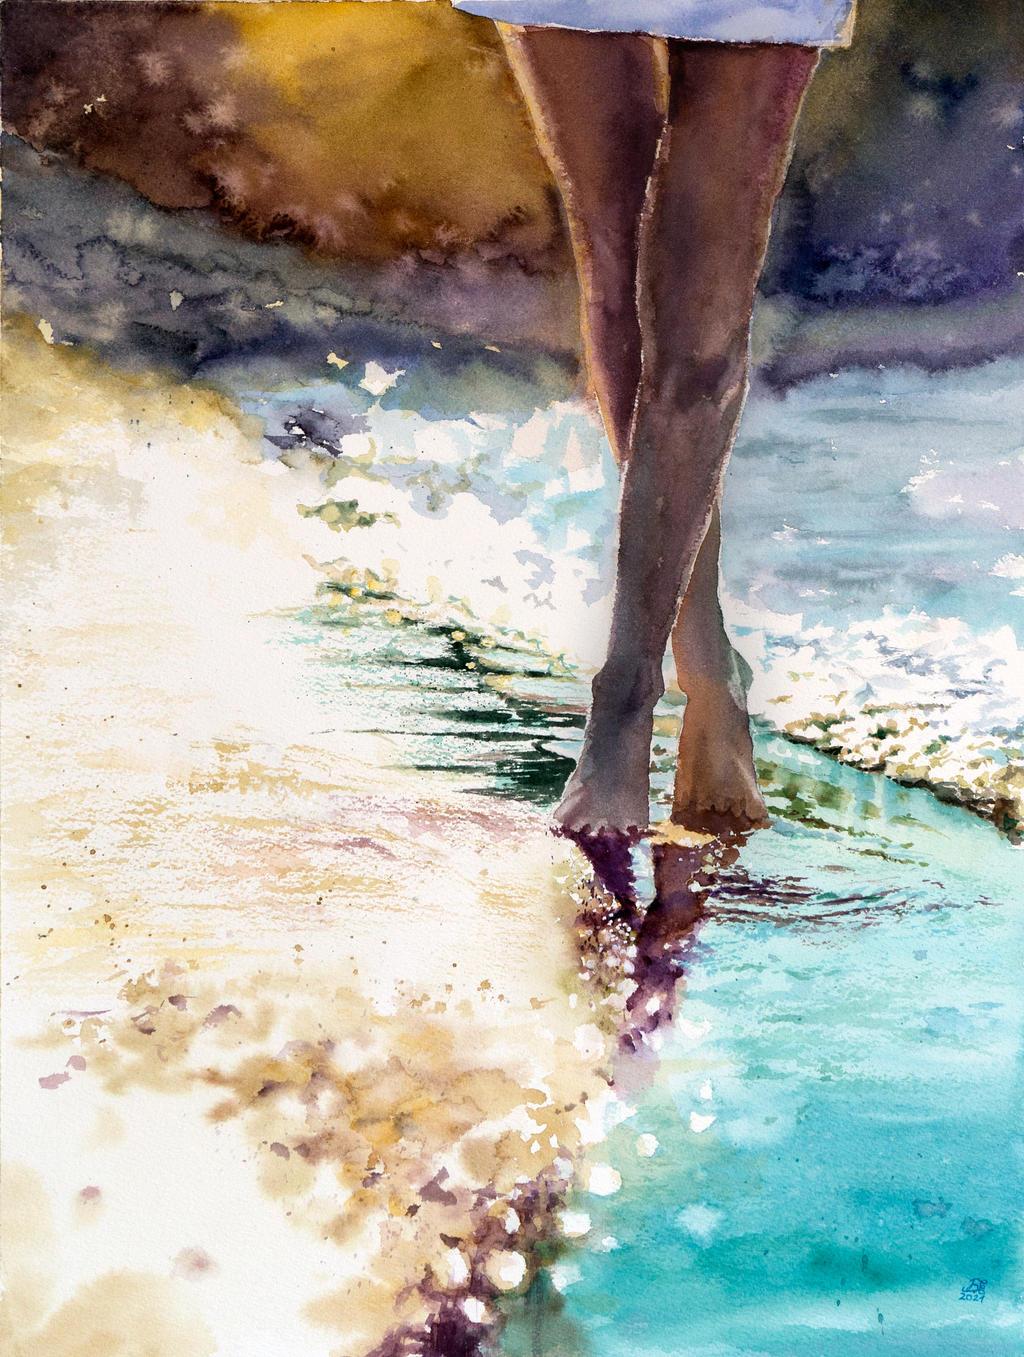 Summer Feeling, Water element